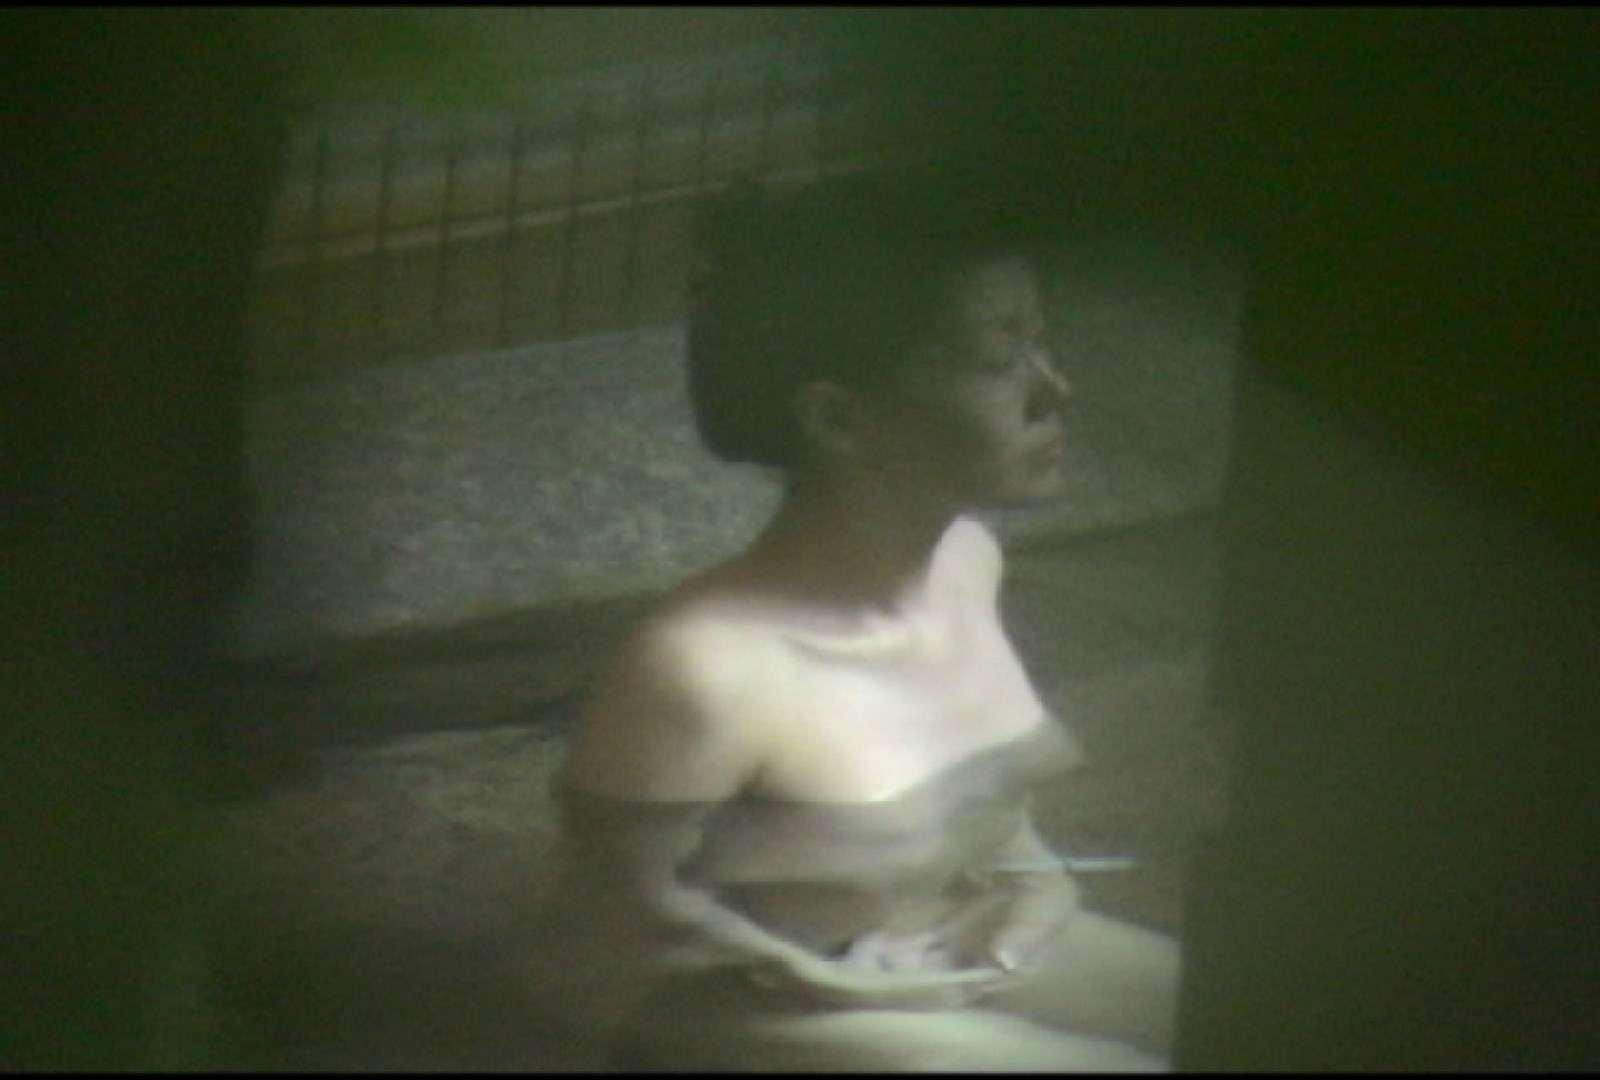 Aquaな露天風呂Vol.699 OL女体 えろ無修正画像 60連発 2